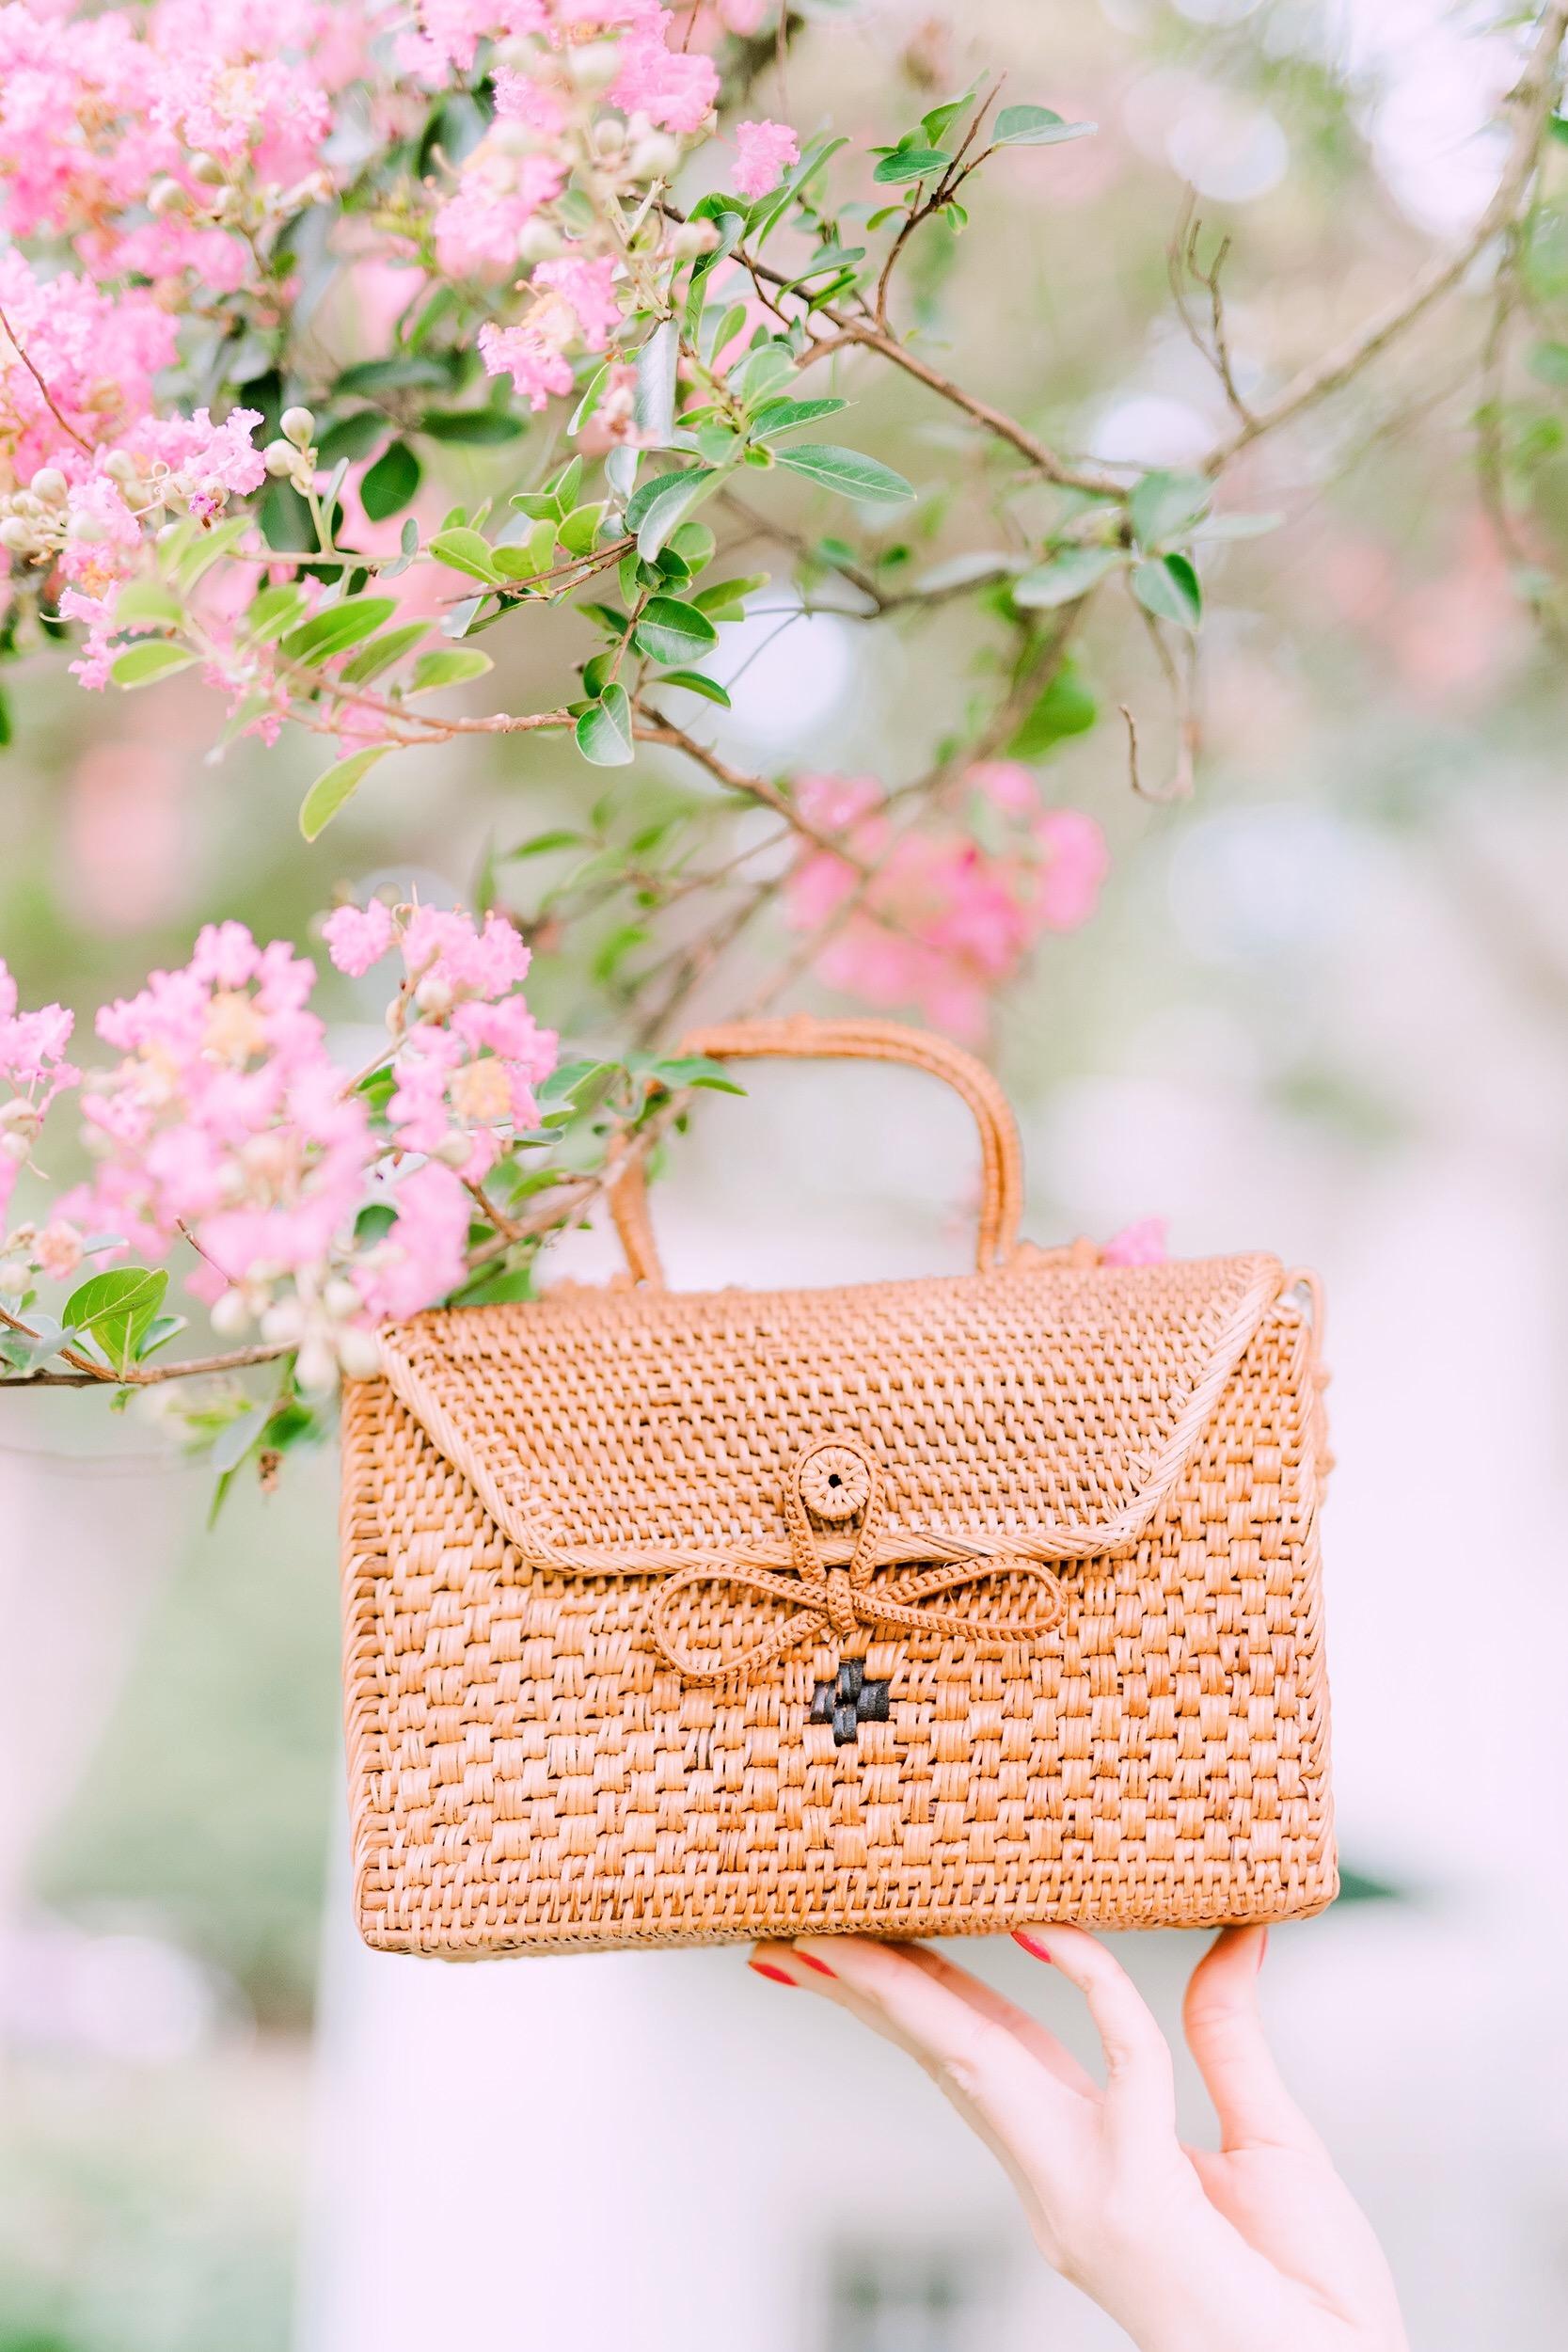 summer straw wicker bag.JPG